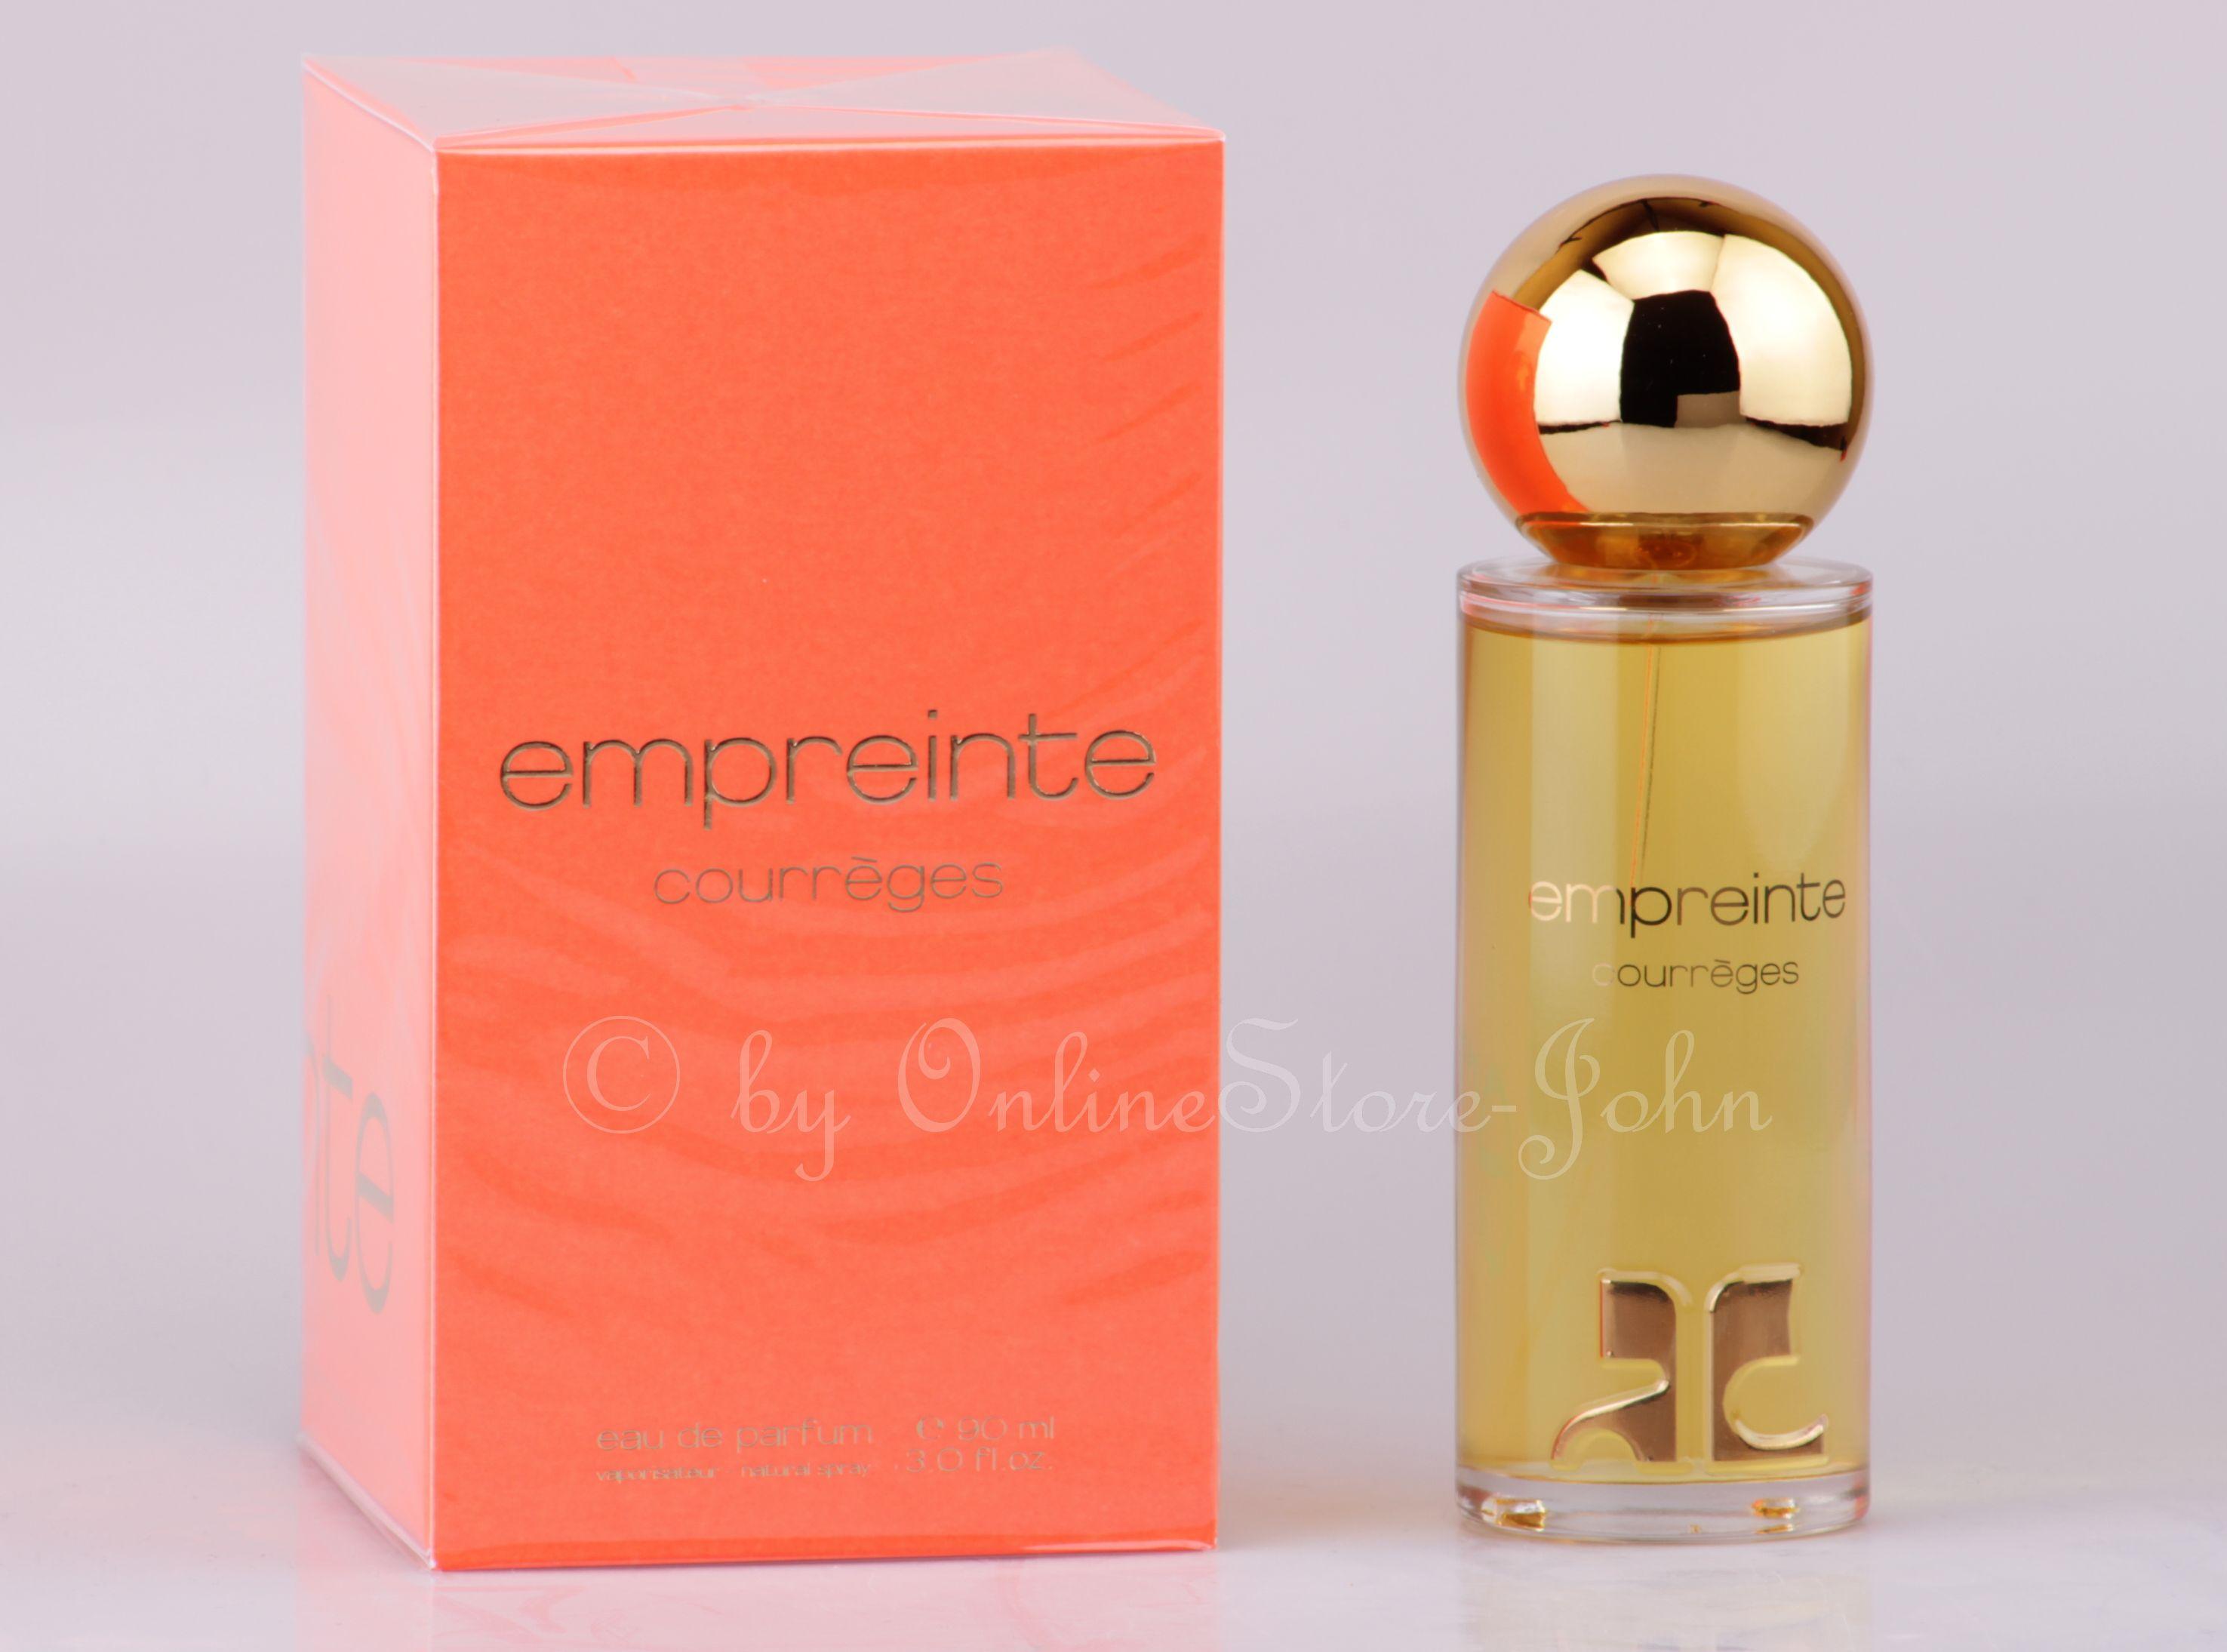 courreges empreinte 90ml edp eau de parfum nip 3442180000048 ebay. Black Bedroom Furniture Sets. Home Design Ideas